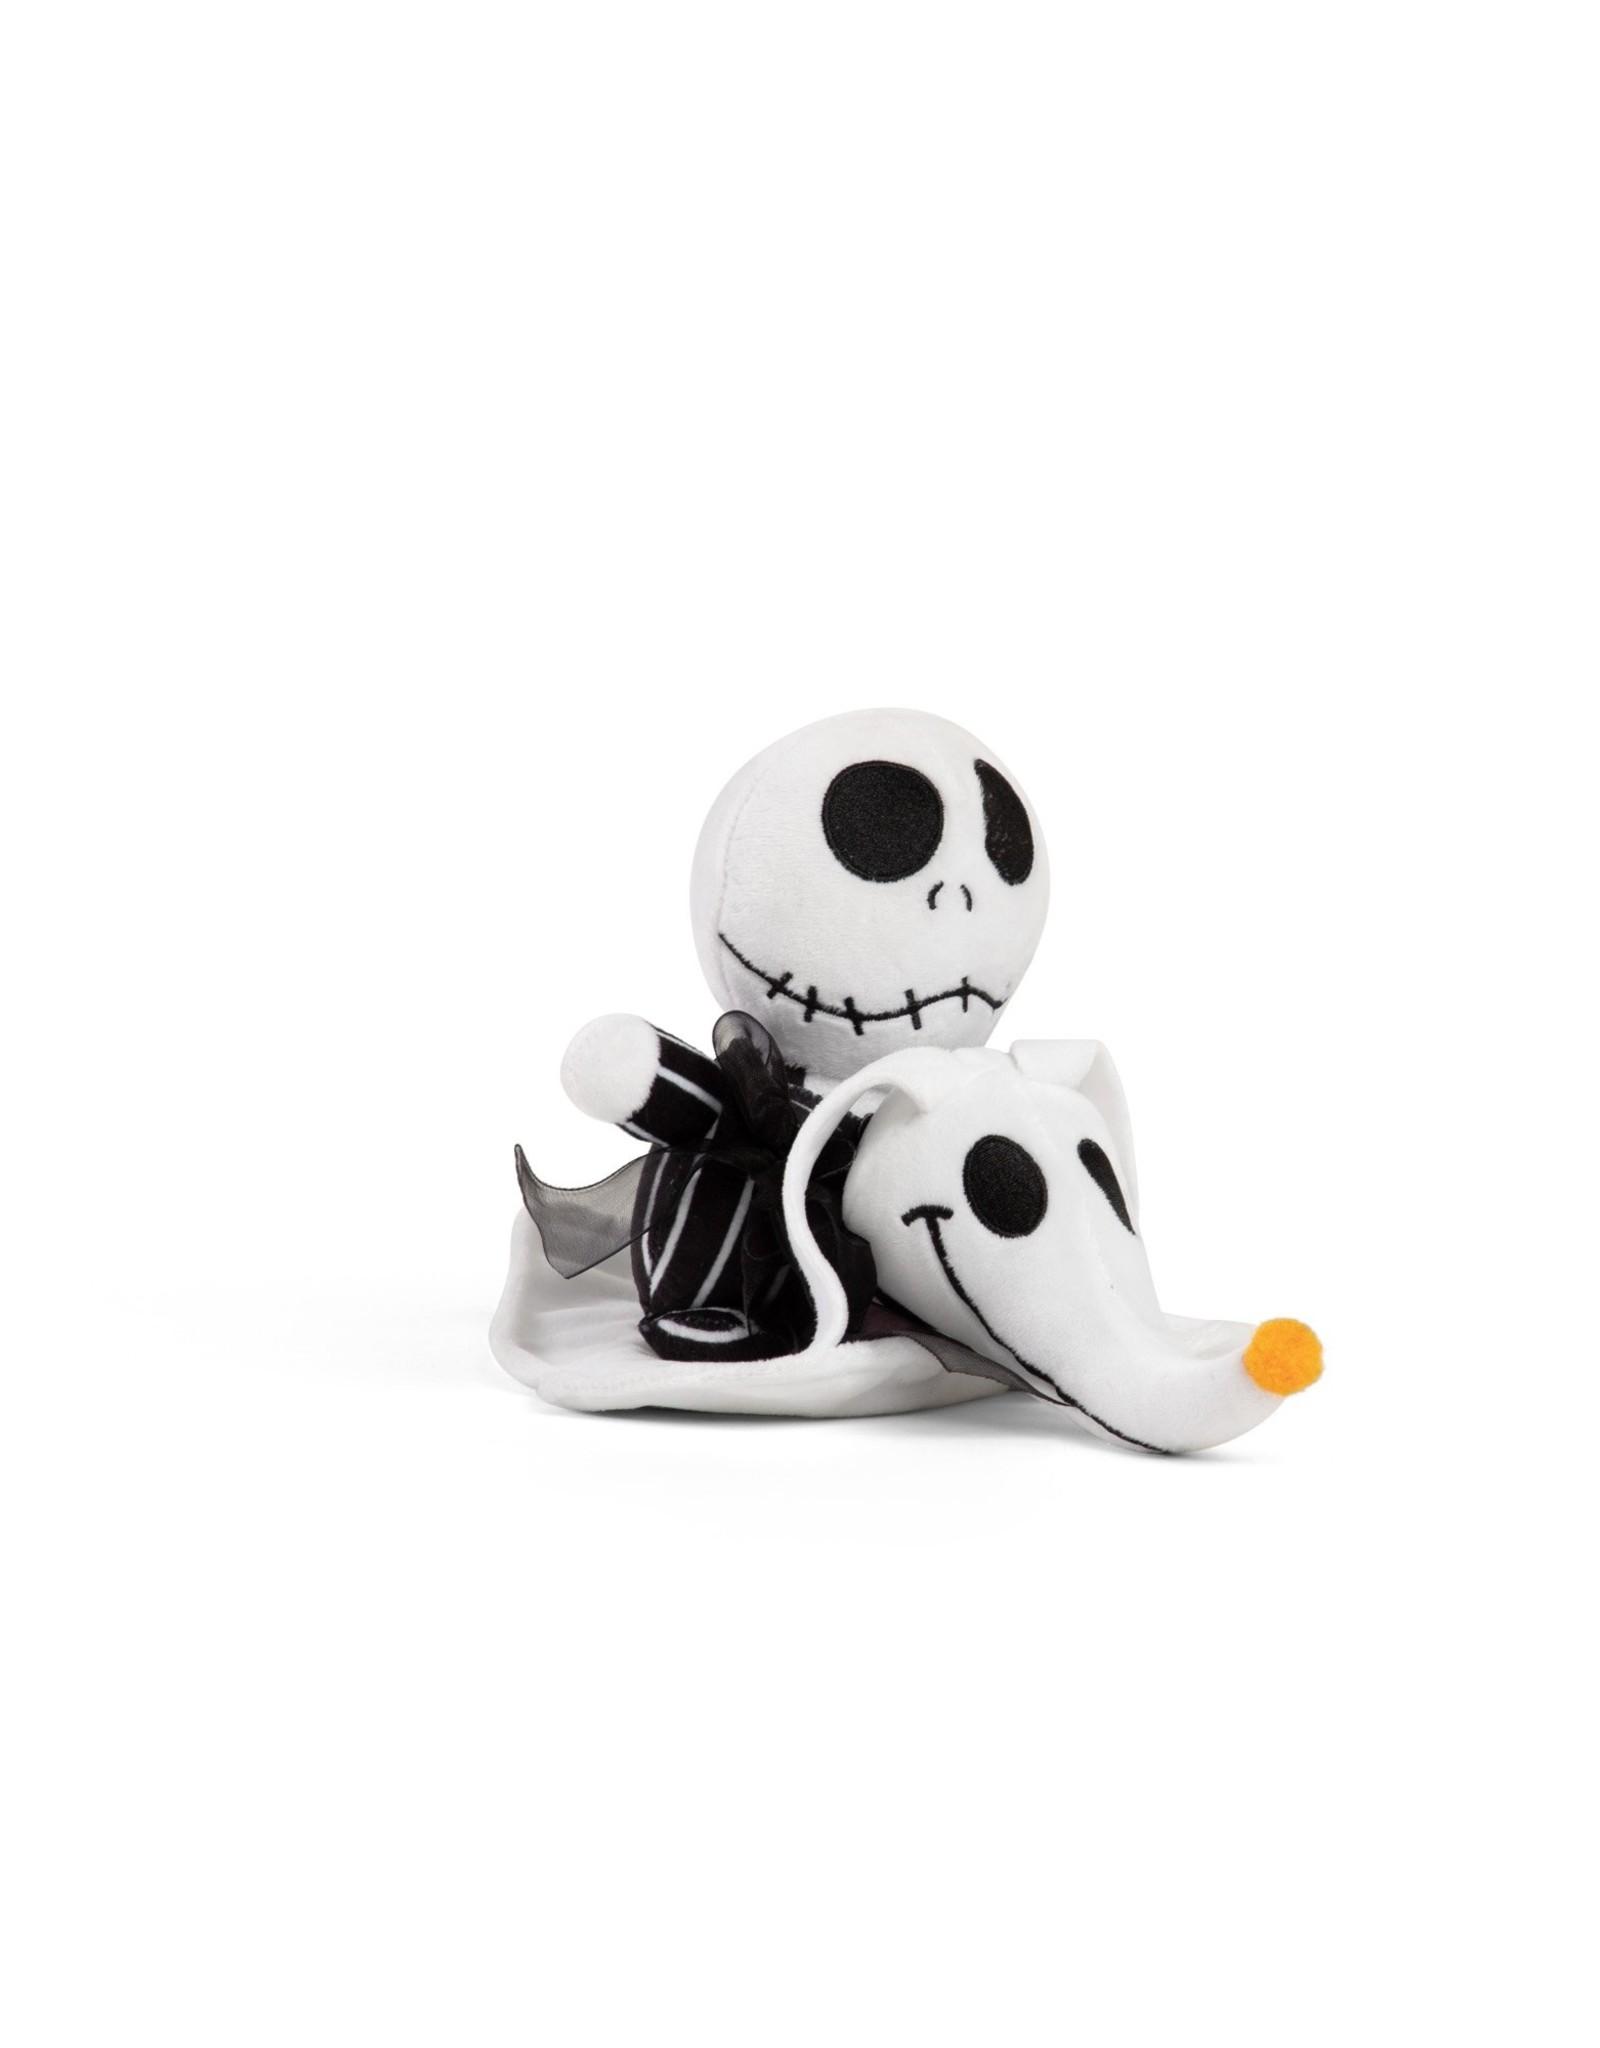 Sentiments Nightmare Before Christmas Jack & Zero Plush Toys 2 Pack